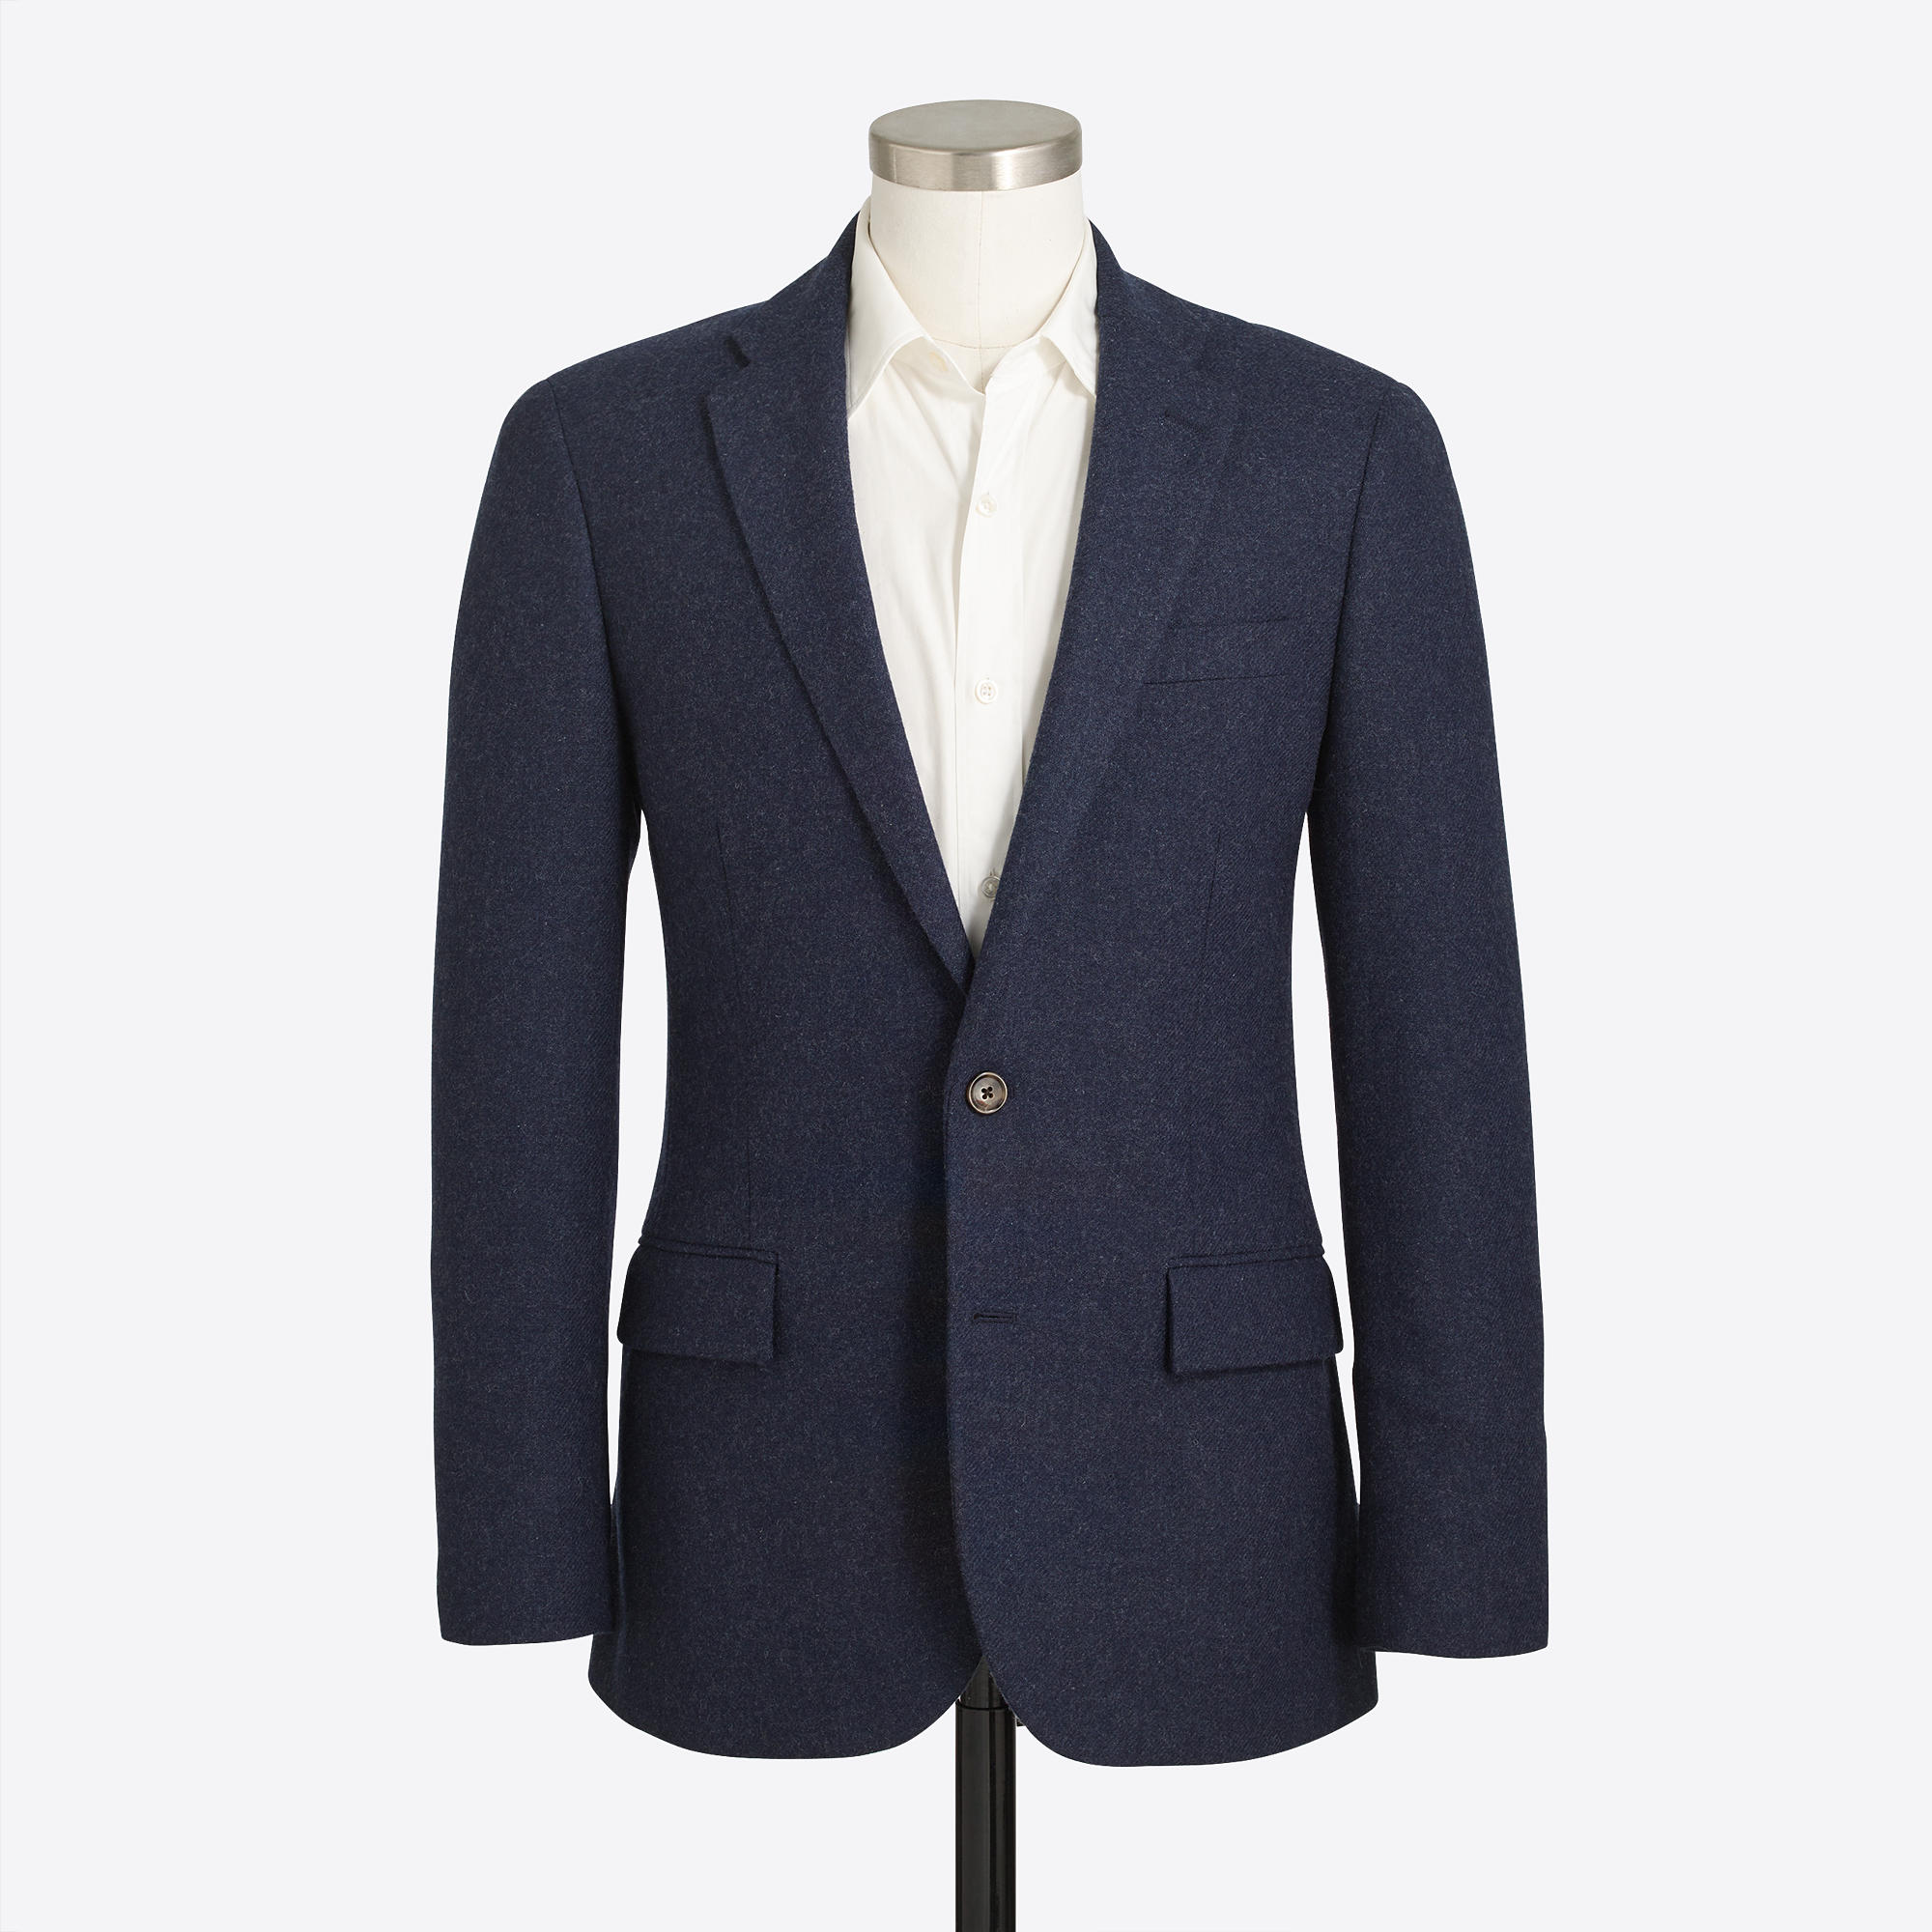 Thompson Blazer In Tweed : FactoryMen Jackets, Vests